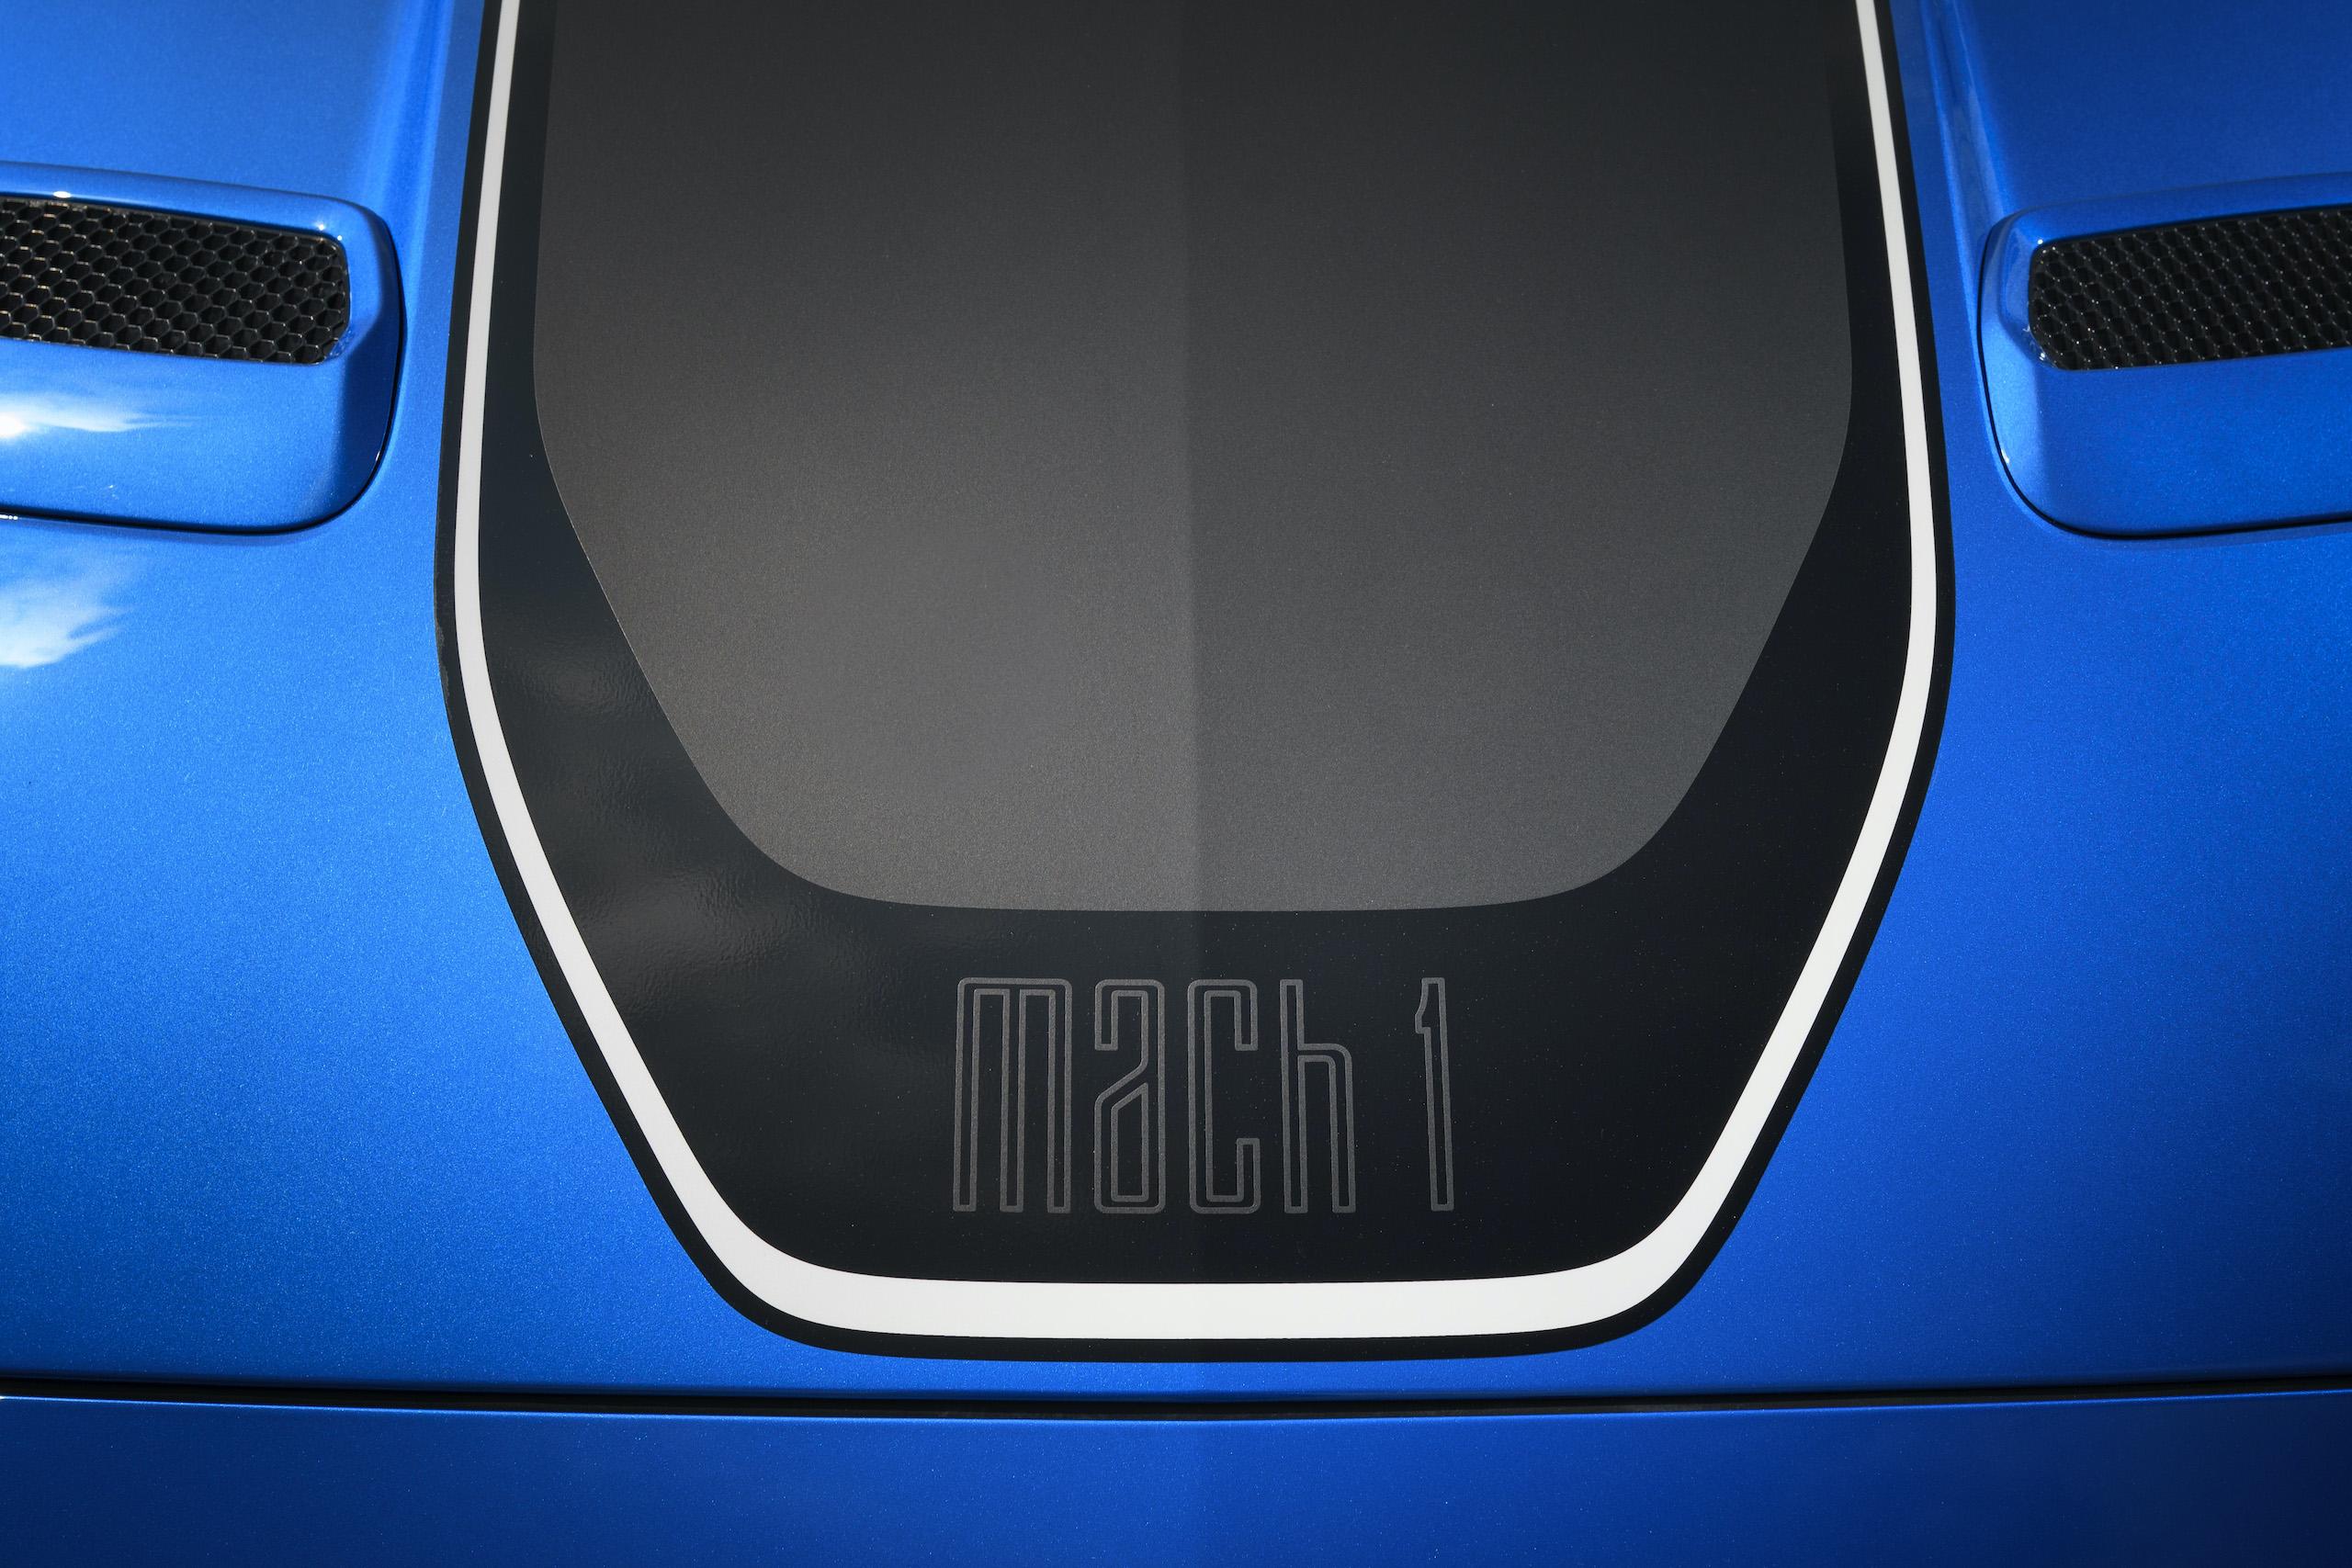 2021 Mustang Mach 1 blue hood detail